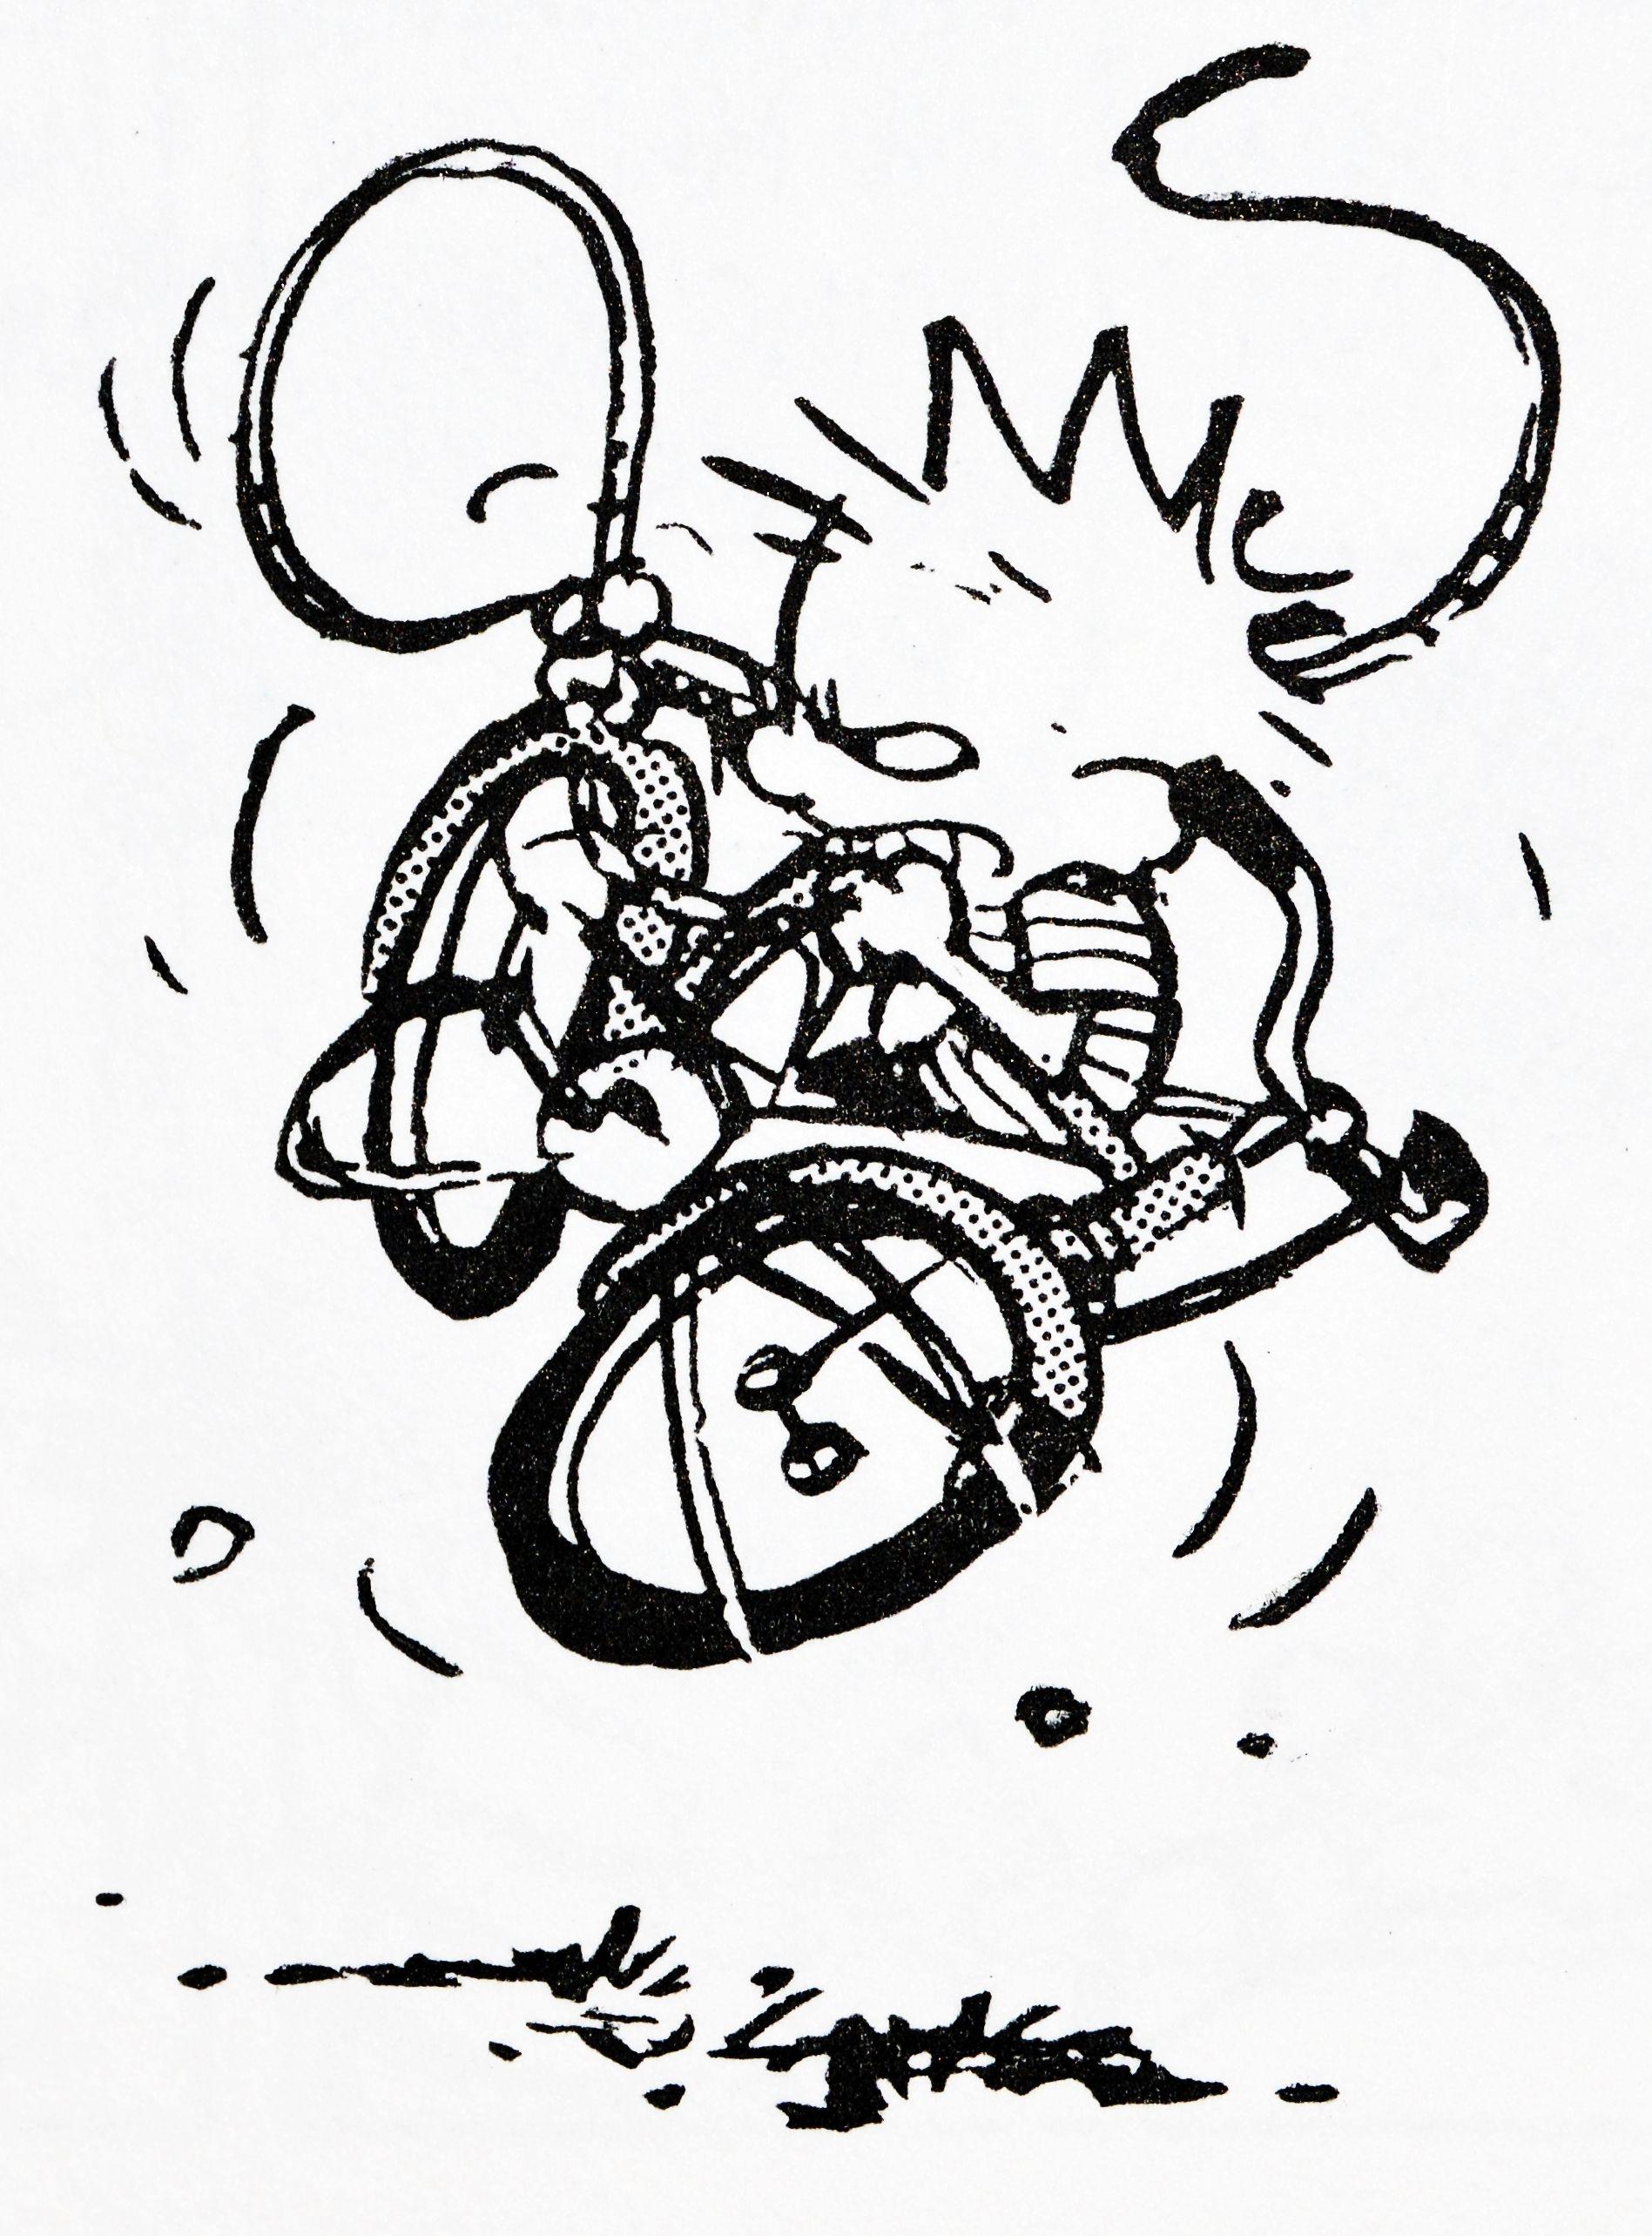 Calvin and Hobbes (DA) - the bike strikes again | Funny | Pinterest ...